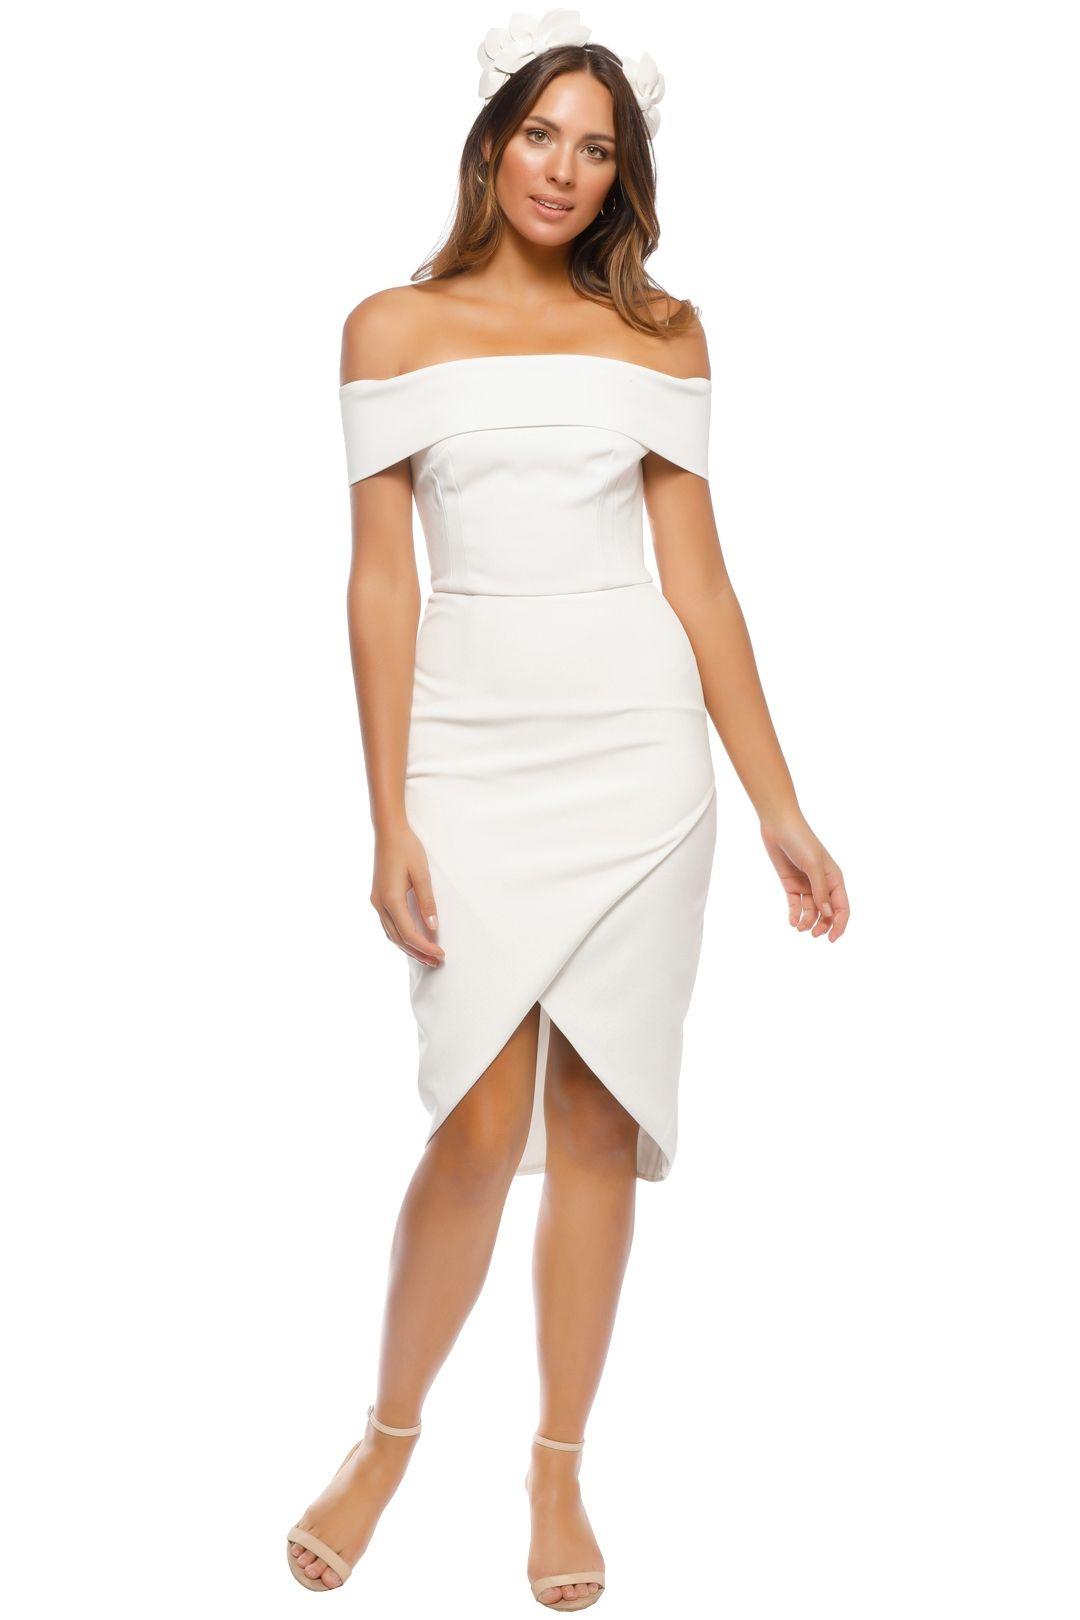 Unspoken - Jamai Short Dress - Ivory - Front